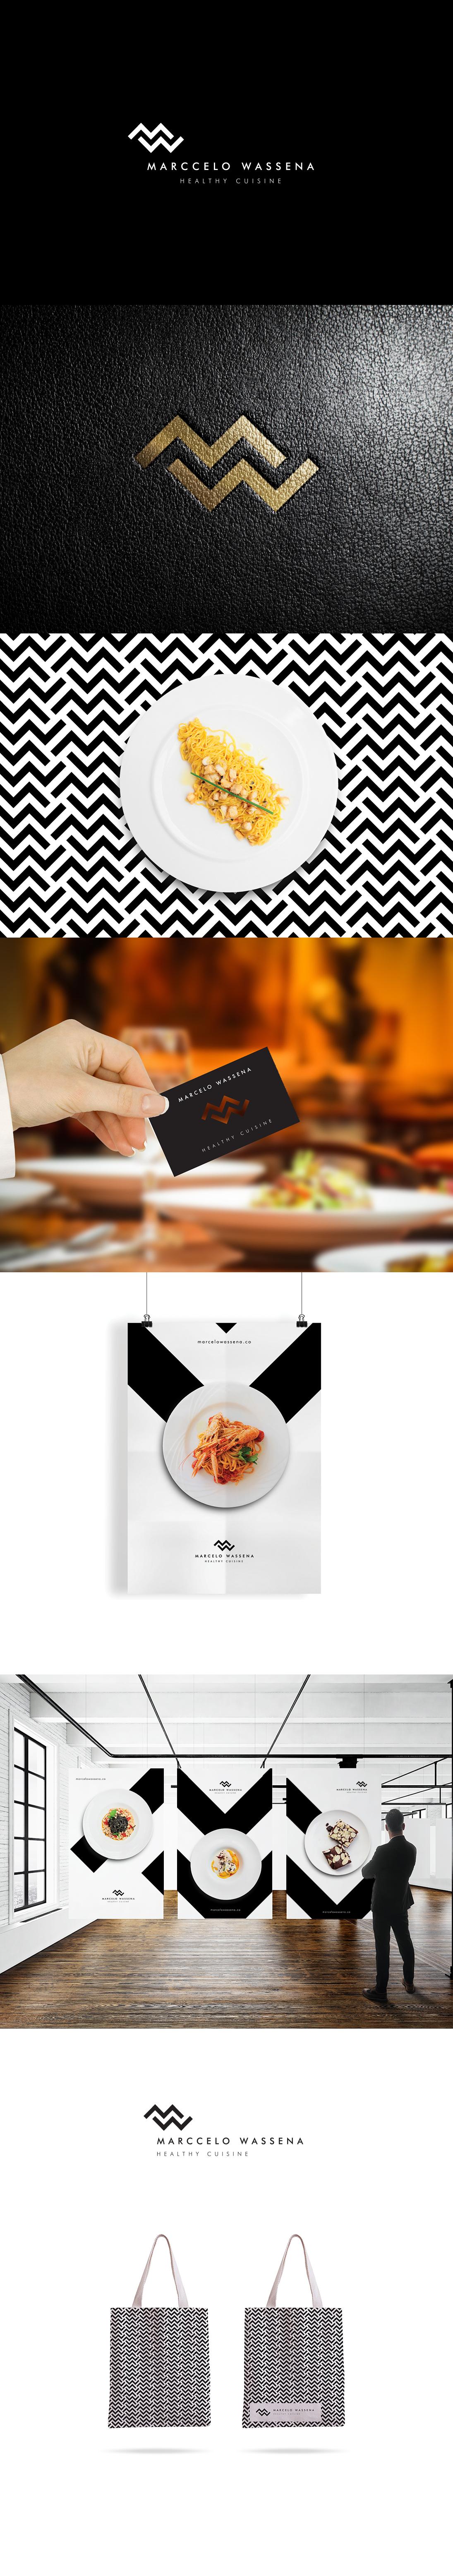 Food  brand branding  identidad identity pattern healthy identidade